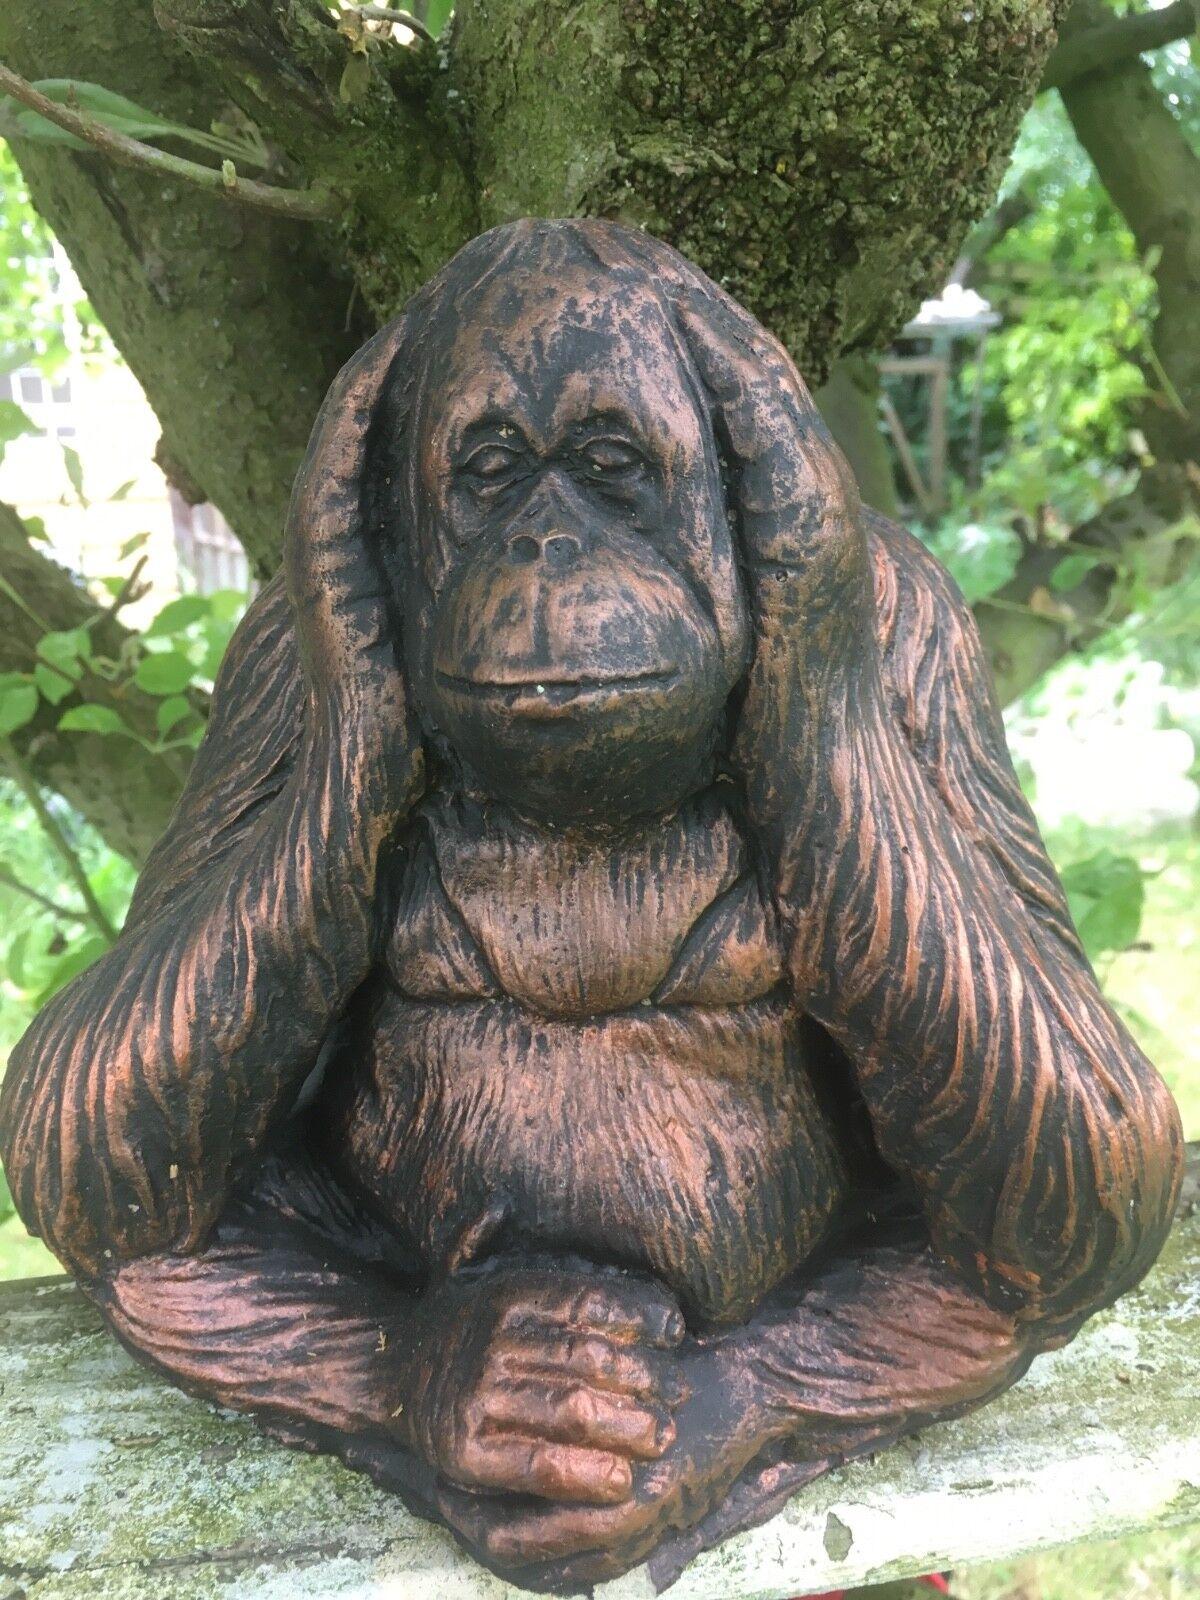 Stone garden ornaments Set of Bronze orangutan wise monkeys monkeys monkeys FREE UK SHIPPPING 408bc3